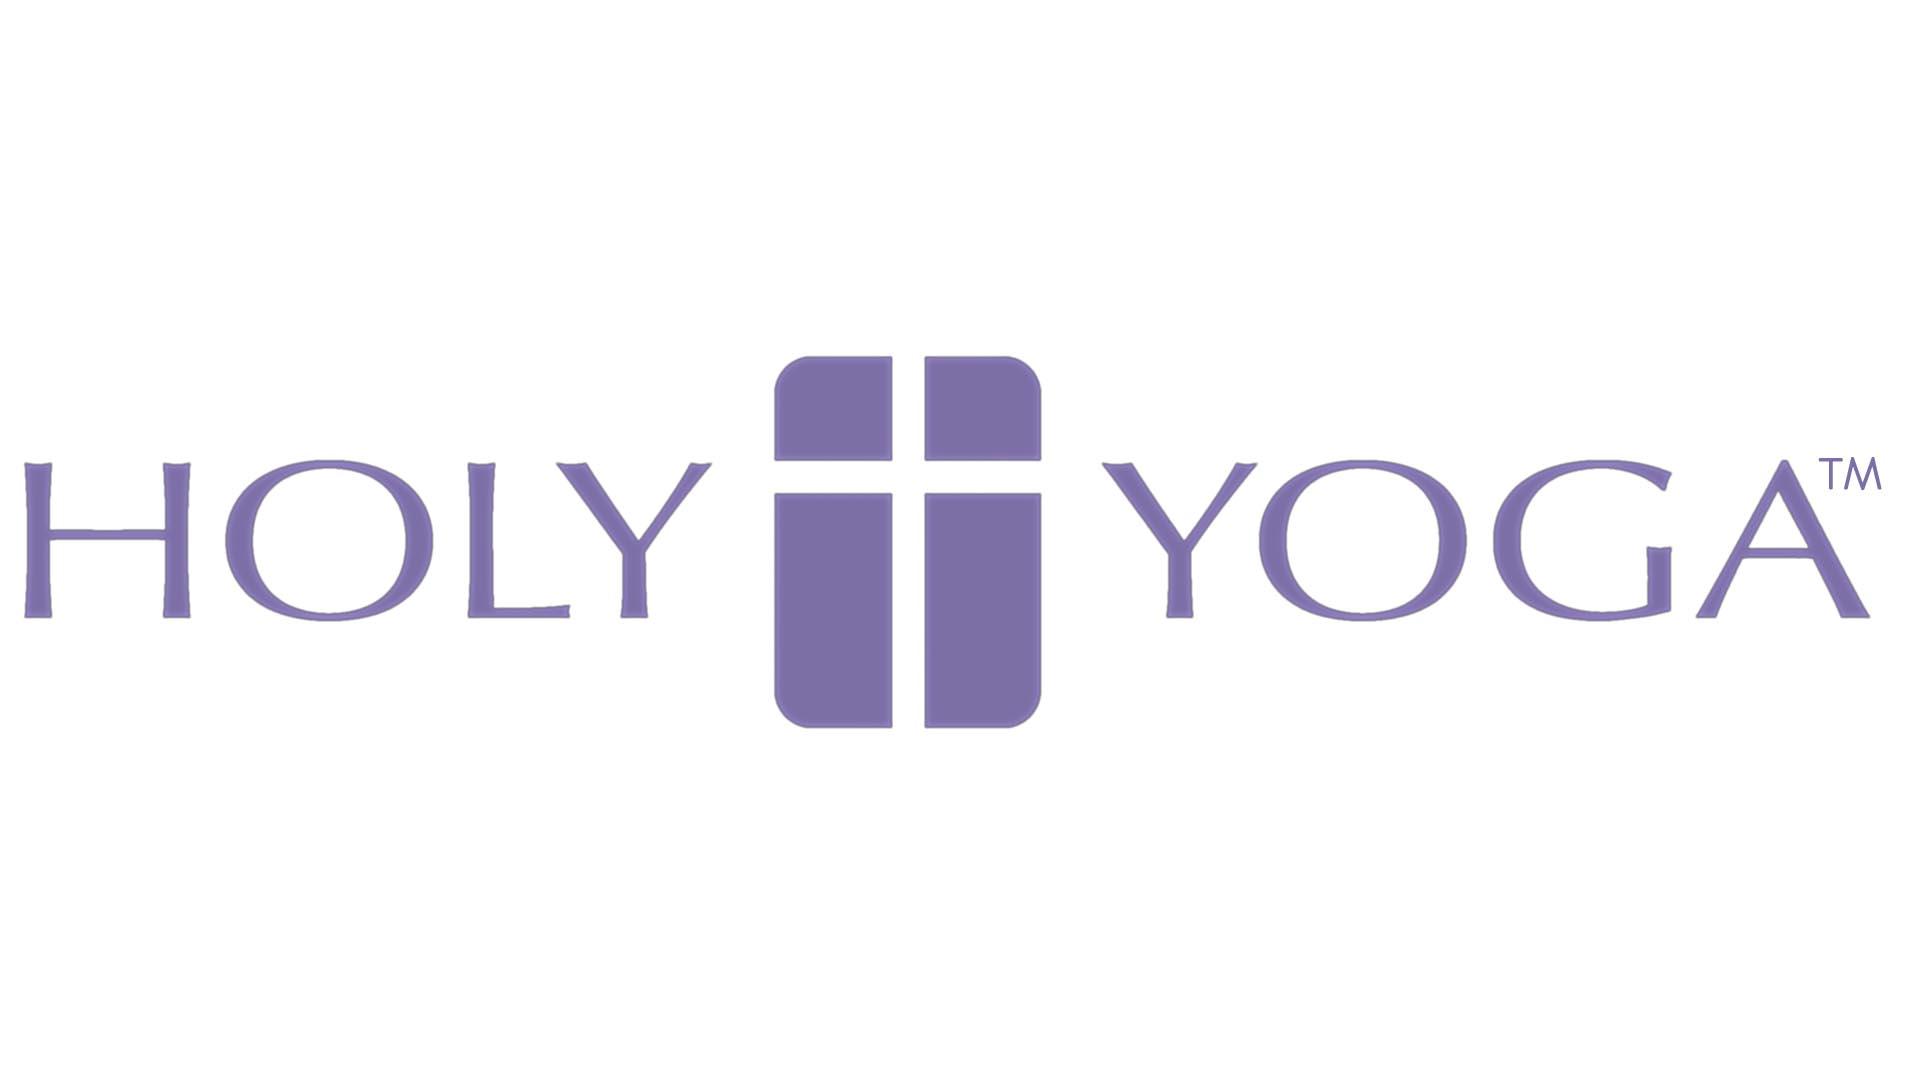 Holy-Yoga+1920X1082+jpeg.jpg